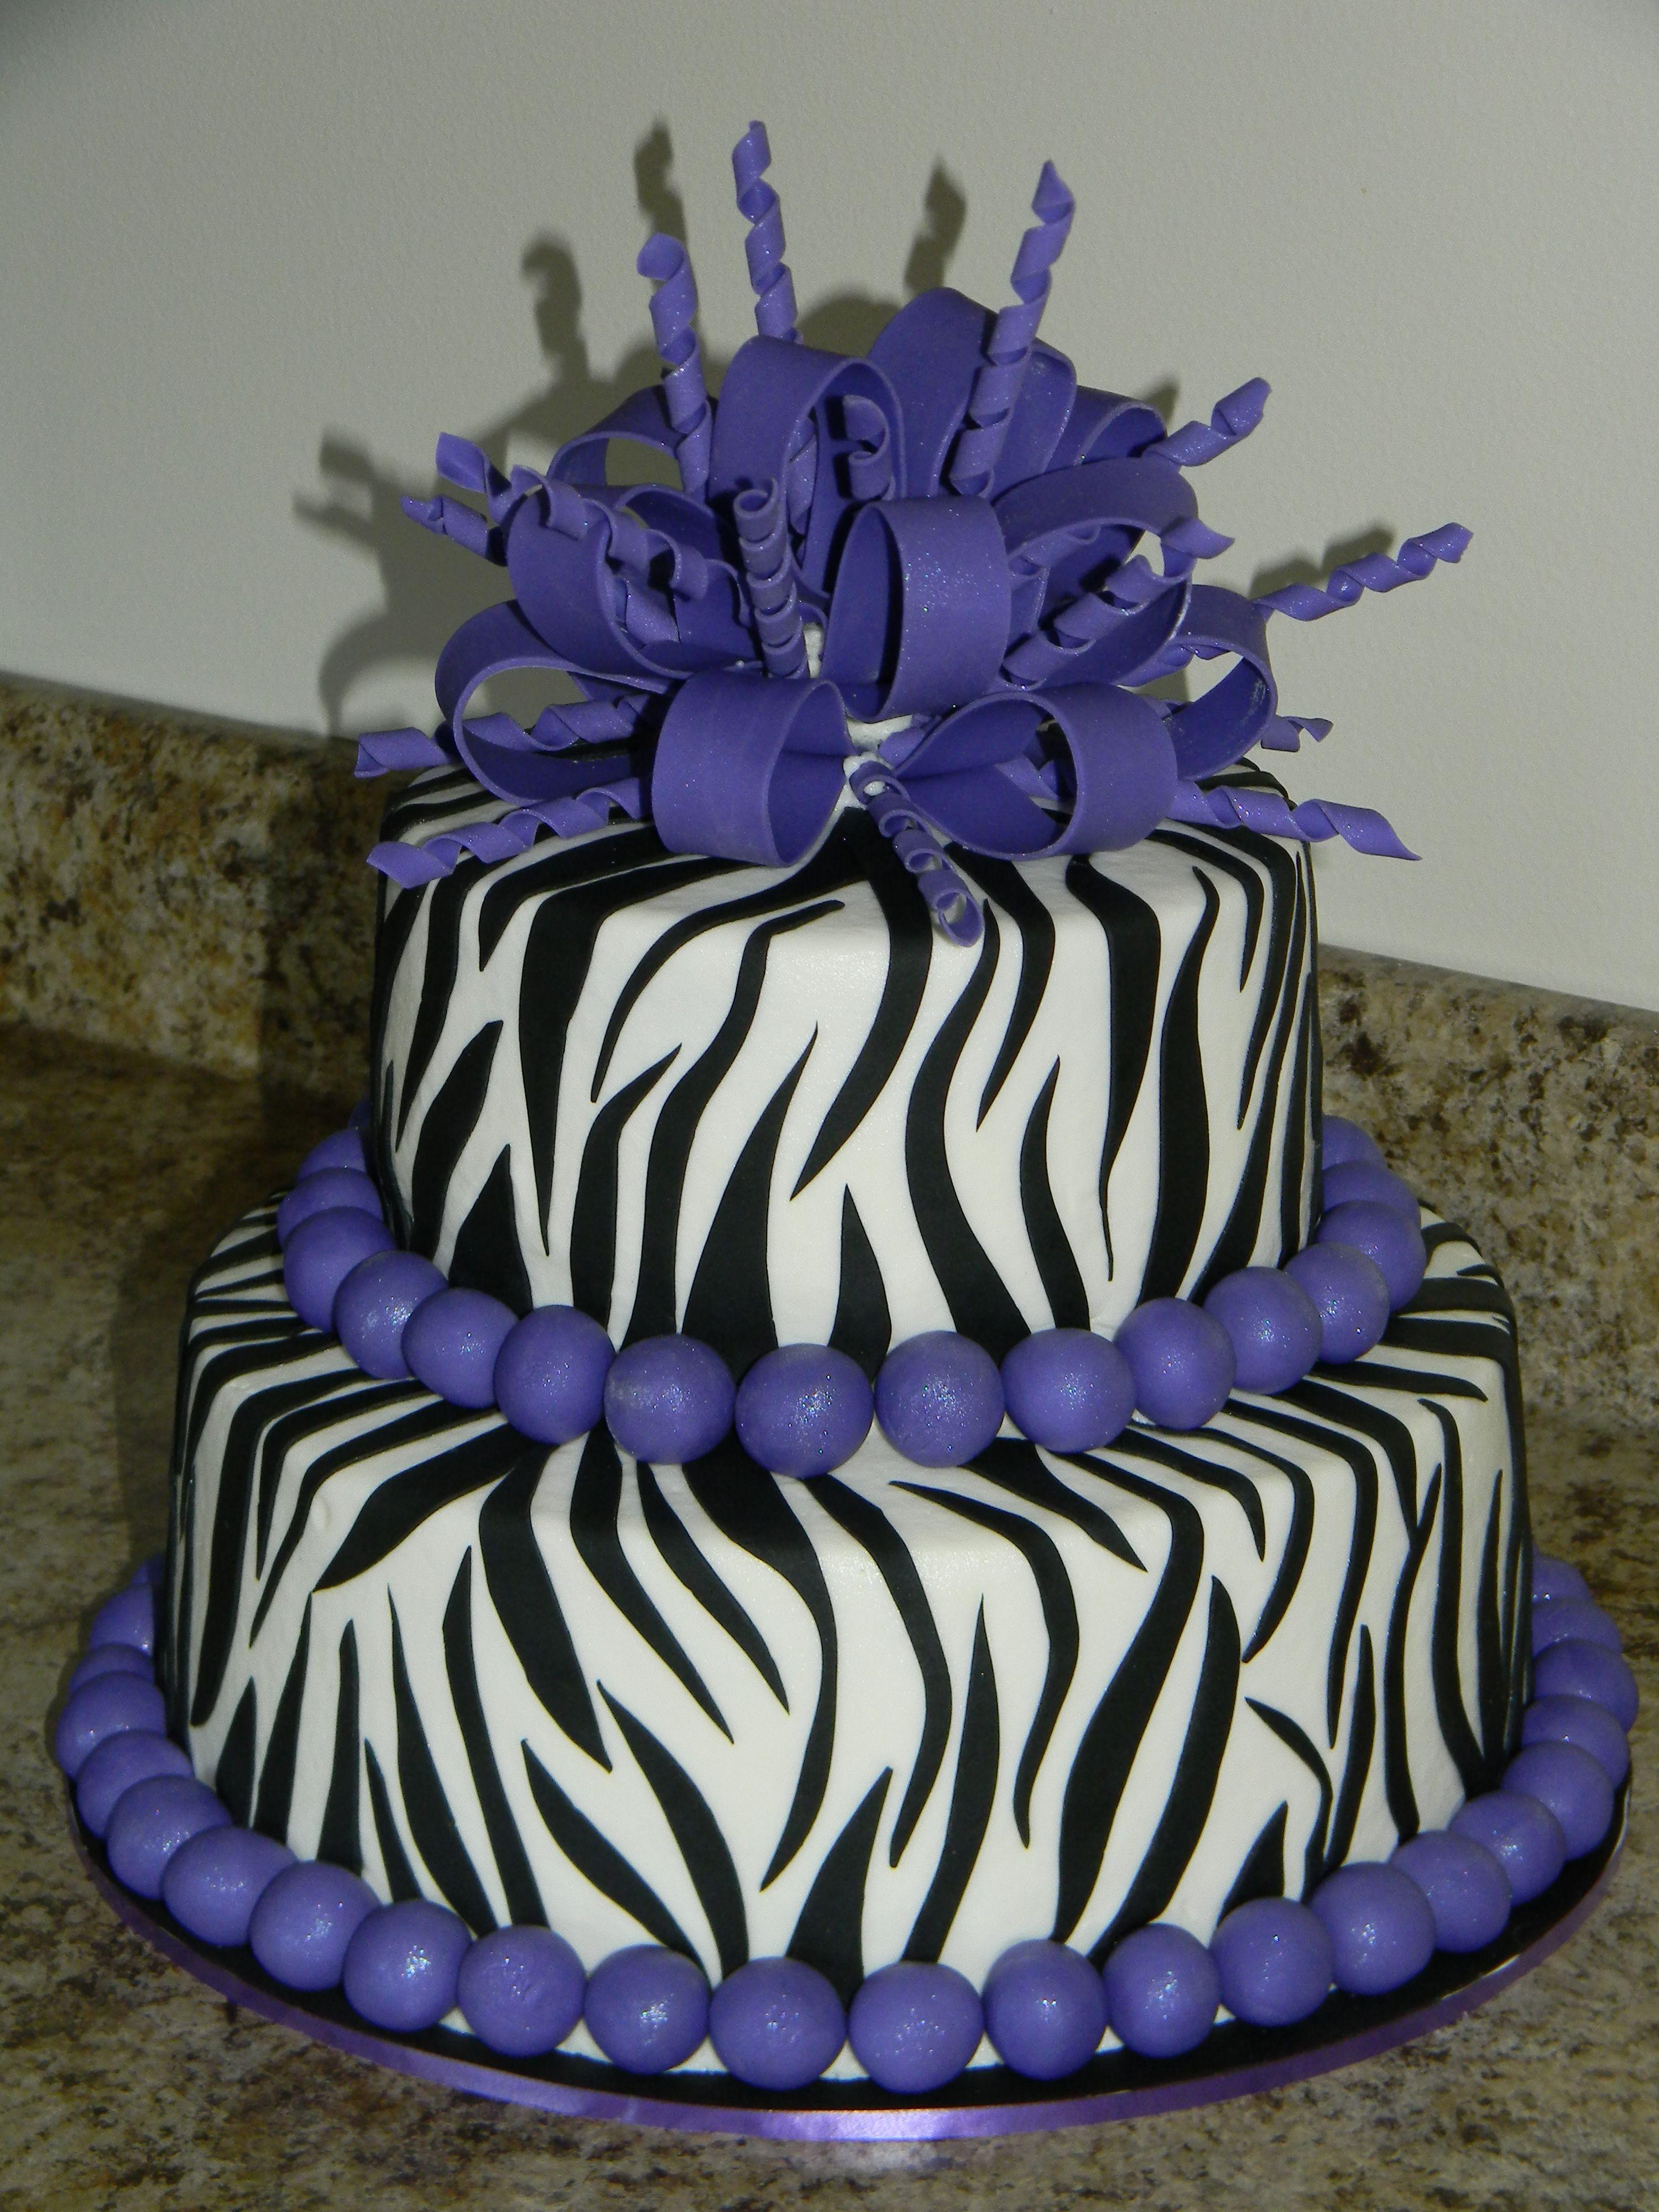 Cake Decorating Zebra Print : purplr cheetah cake decorations Purple Zebra Birthday cake - Cake Decorating Community - Cakes ...